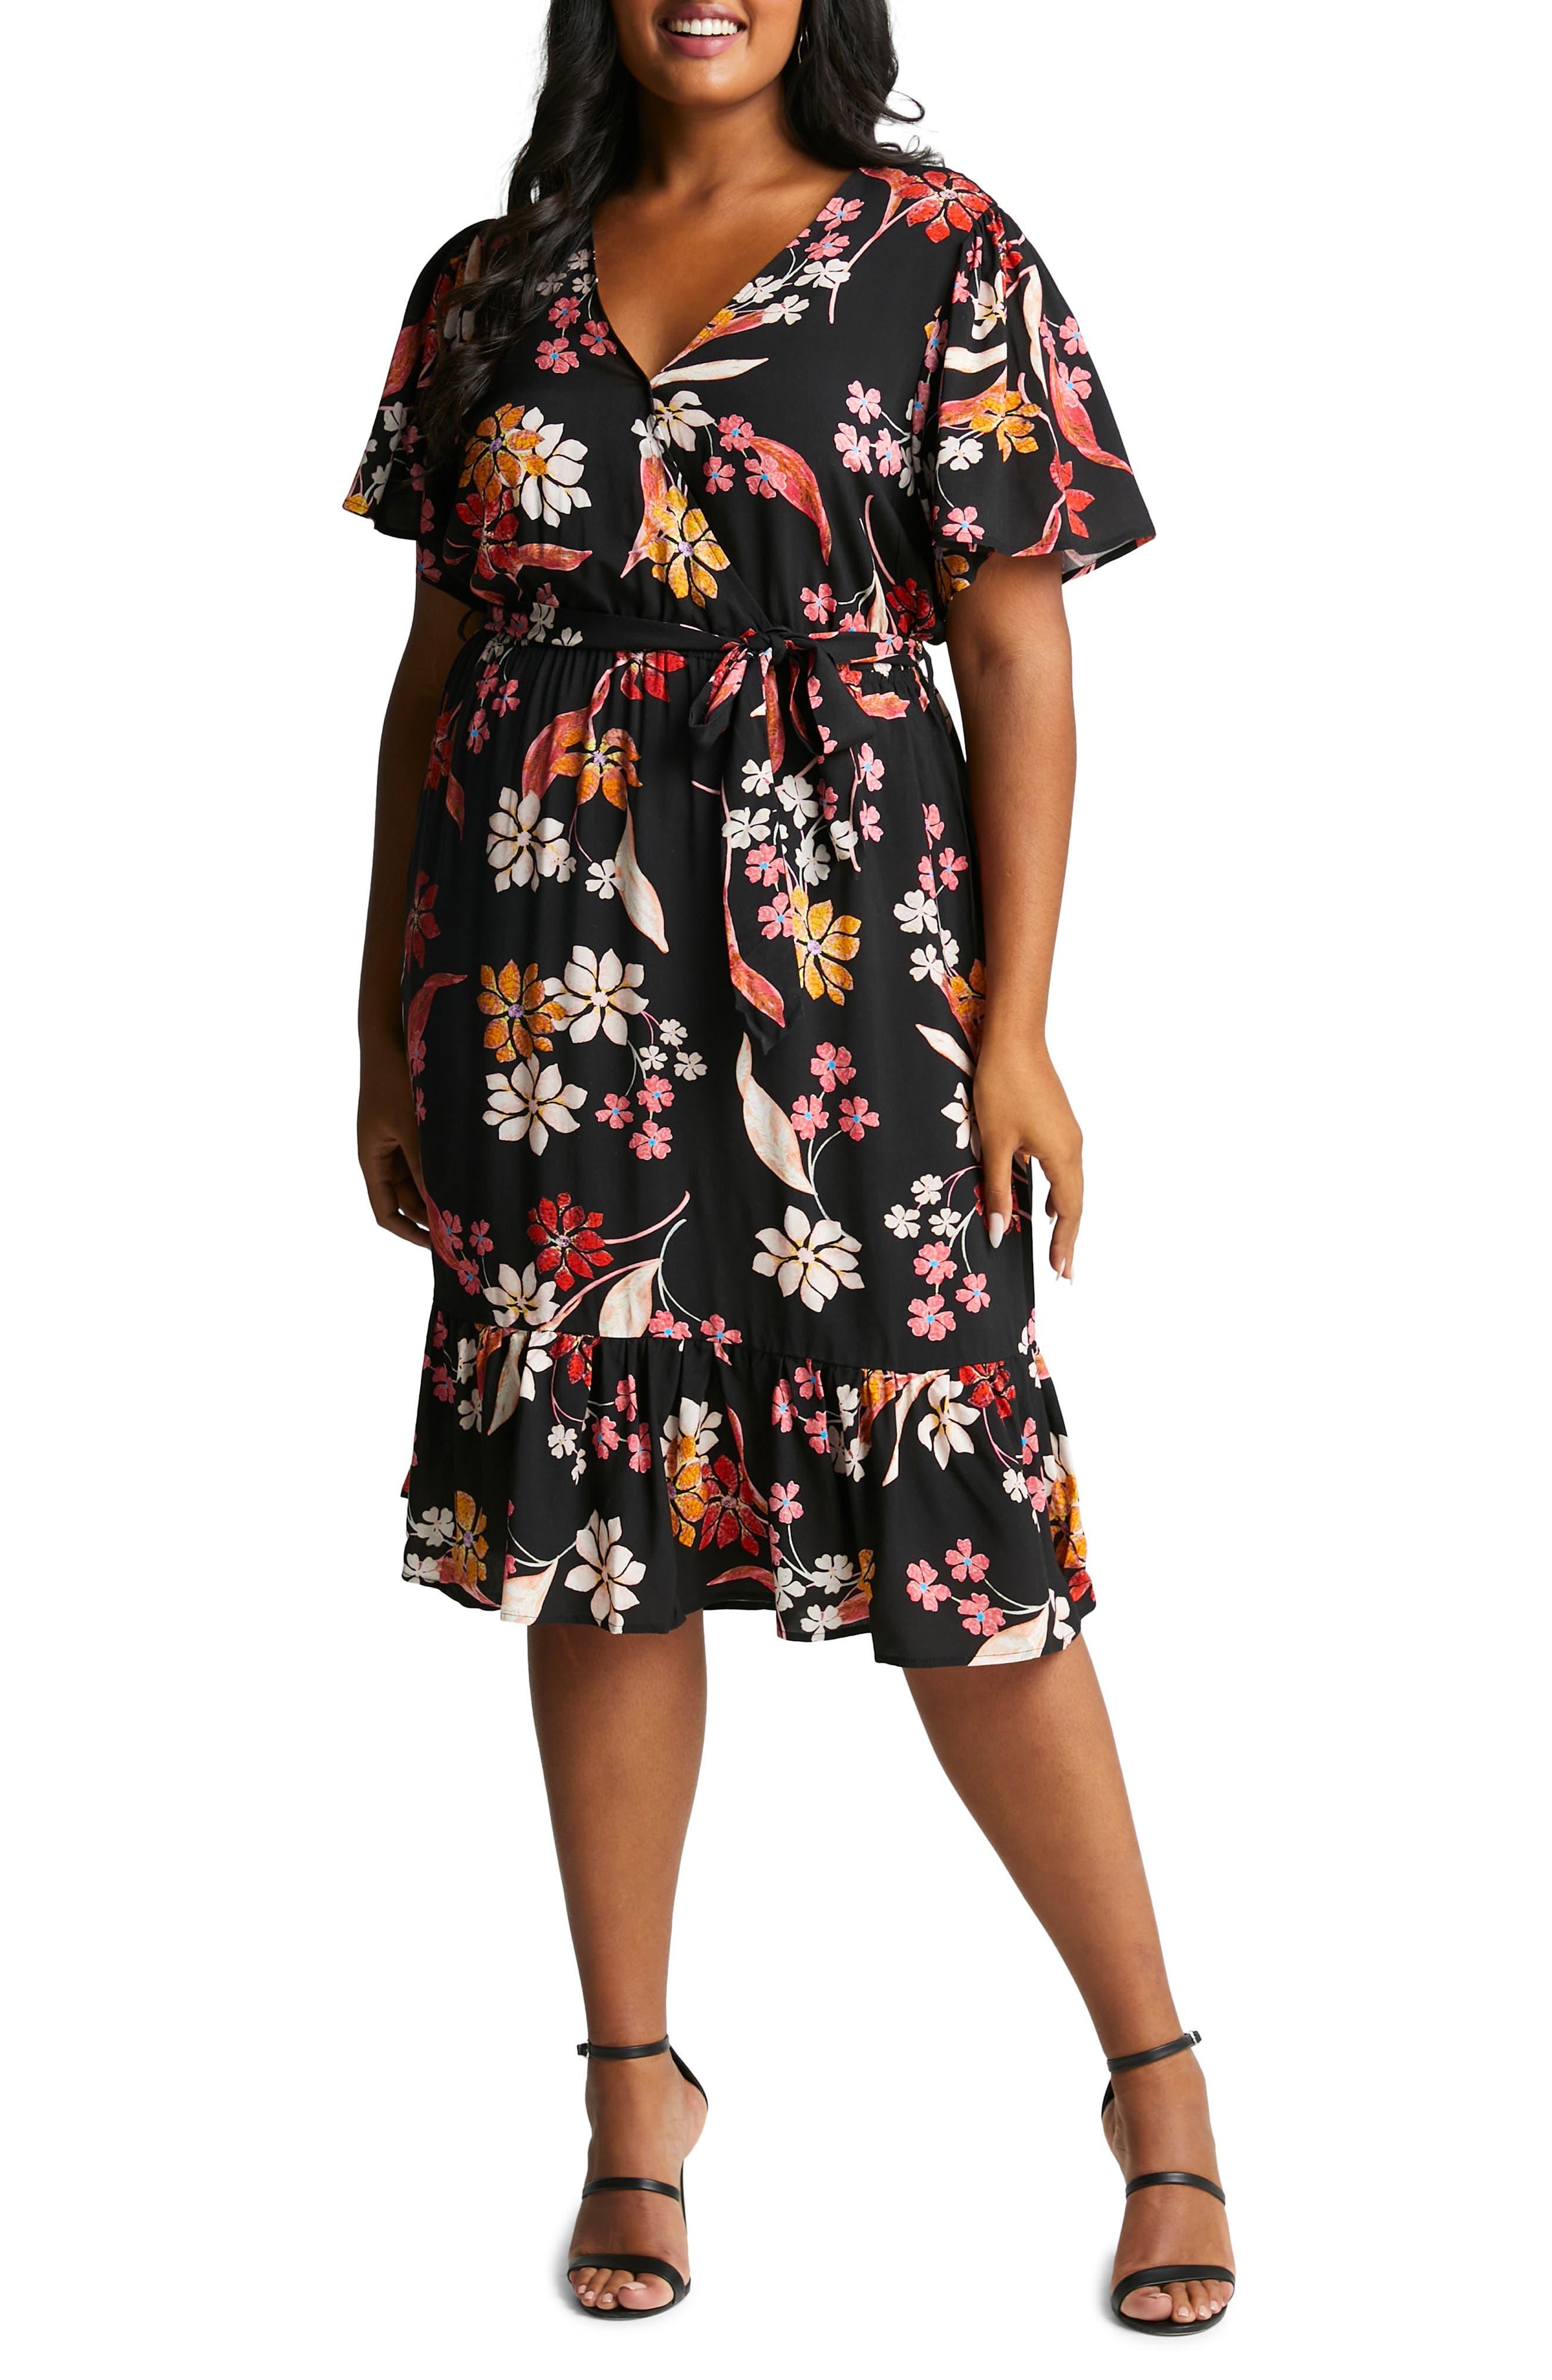 Women Plus Size Red Black Wrap Floral Open Front Fit Flare Maxi Dress  1X